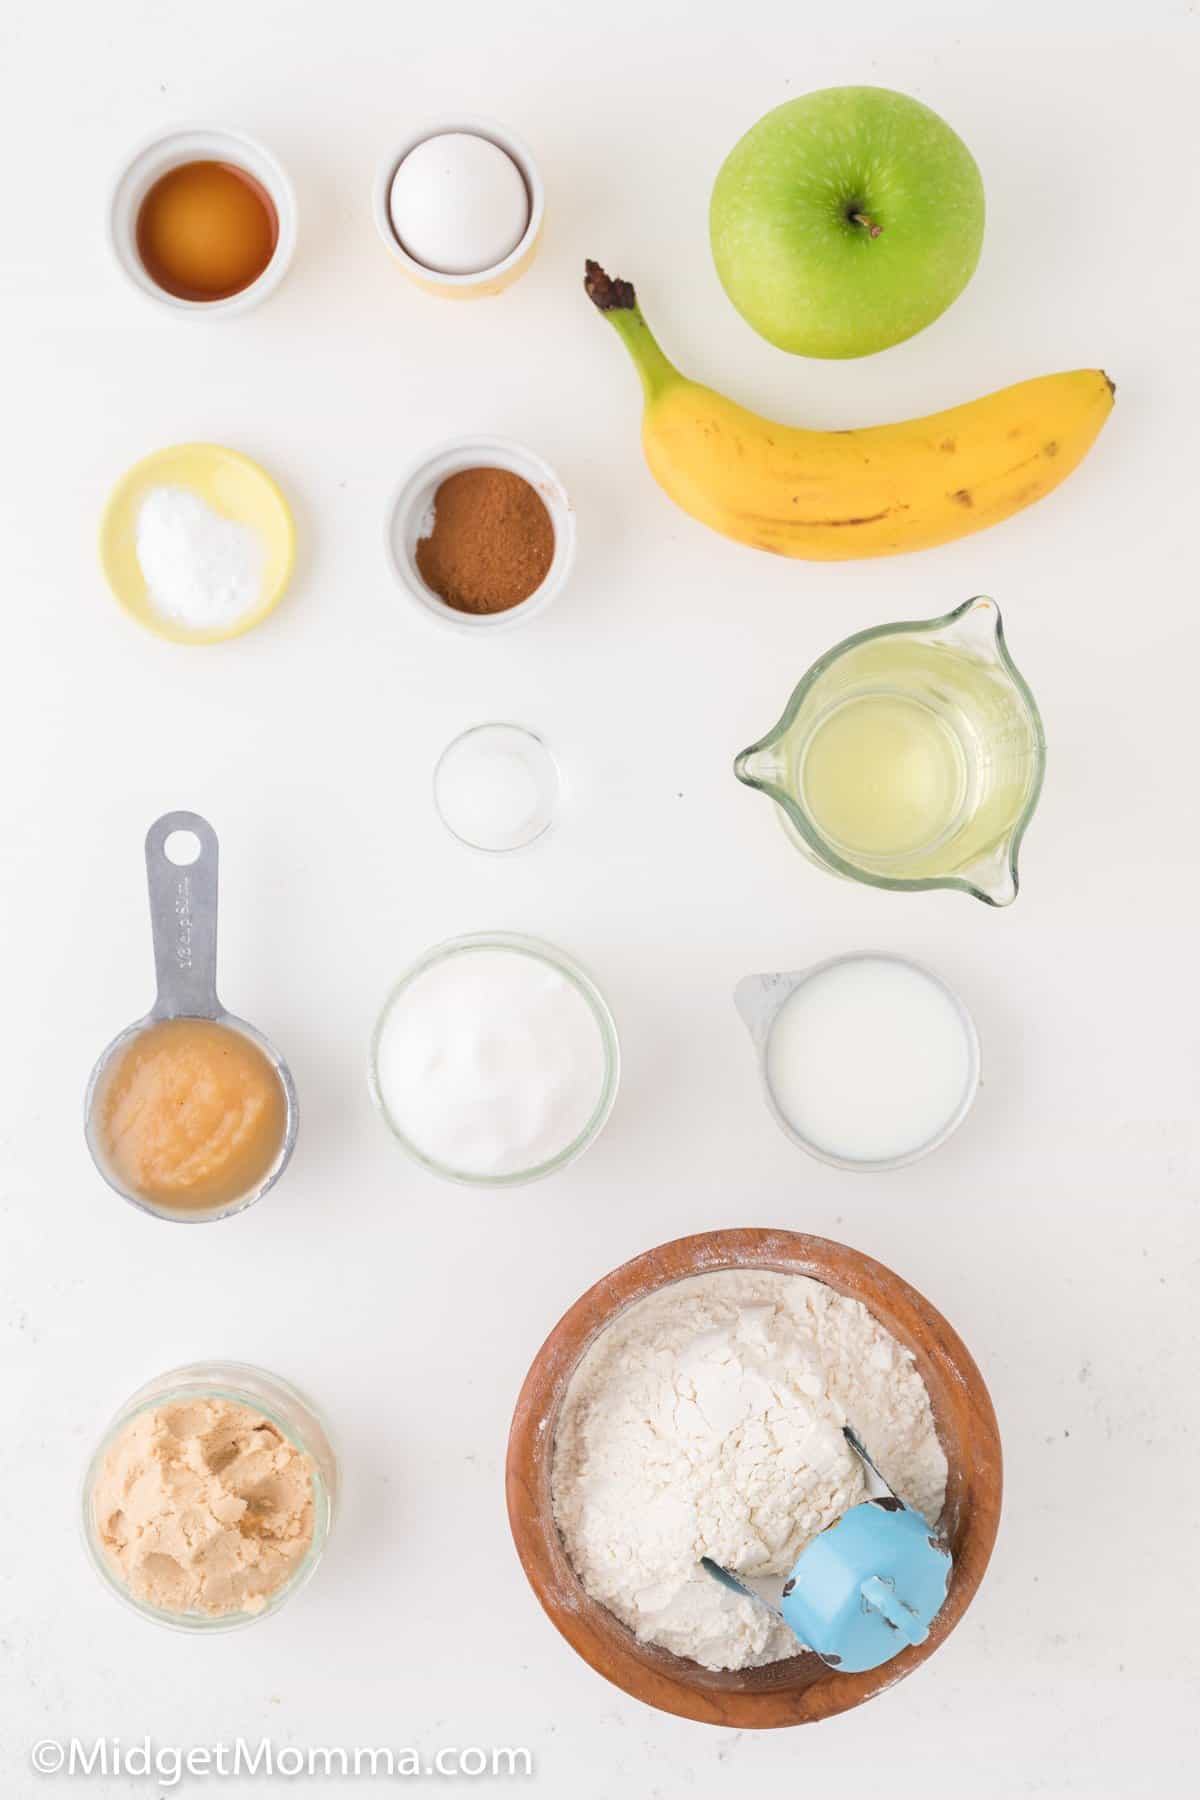 Banana Apple Bread ingredients